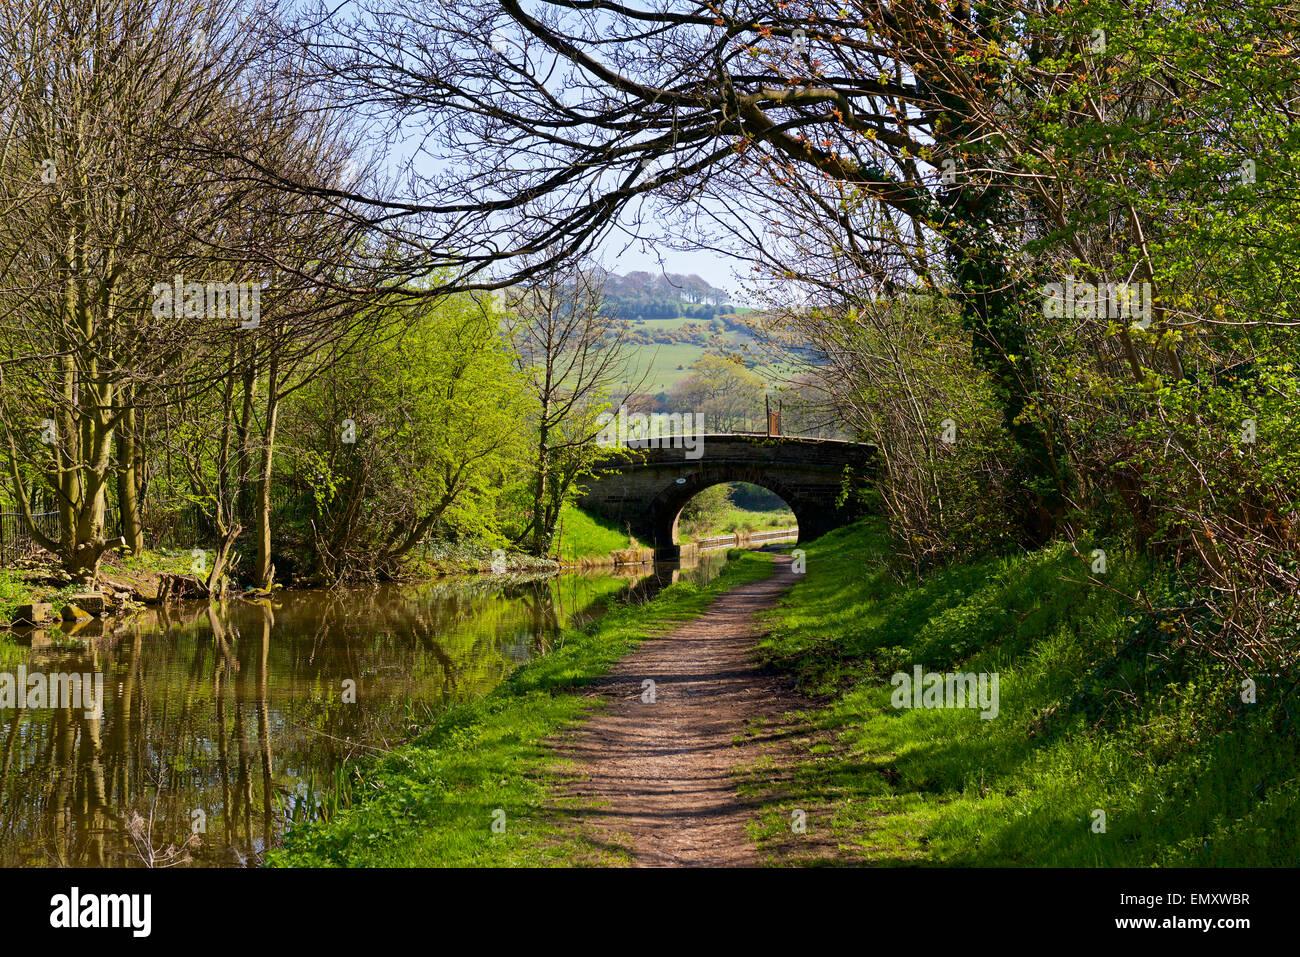 The Macclesfield Canal near Macclesfield, Cheshire, England UK - Stock Image